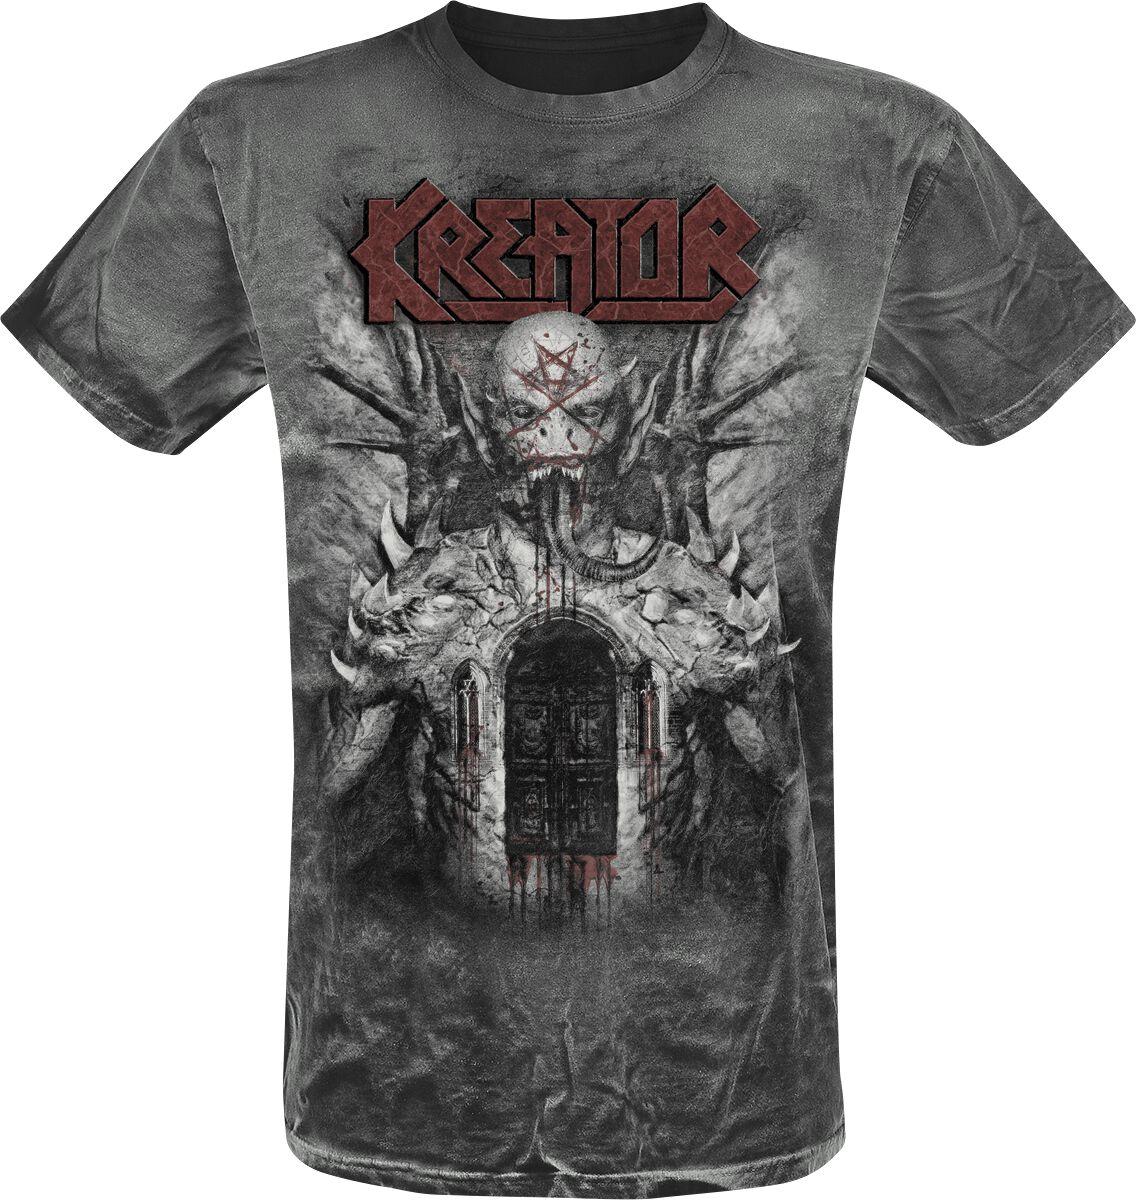 Zespoły - Koszulki - T-Shirt Kreator GoV Vintage T-Shirt czarny - 349161